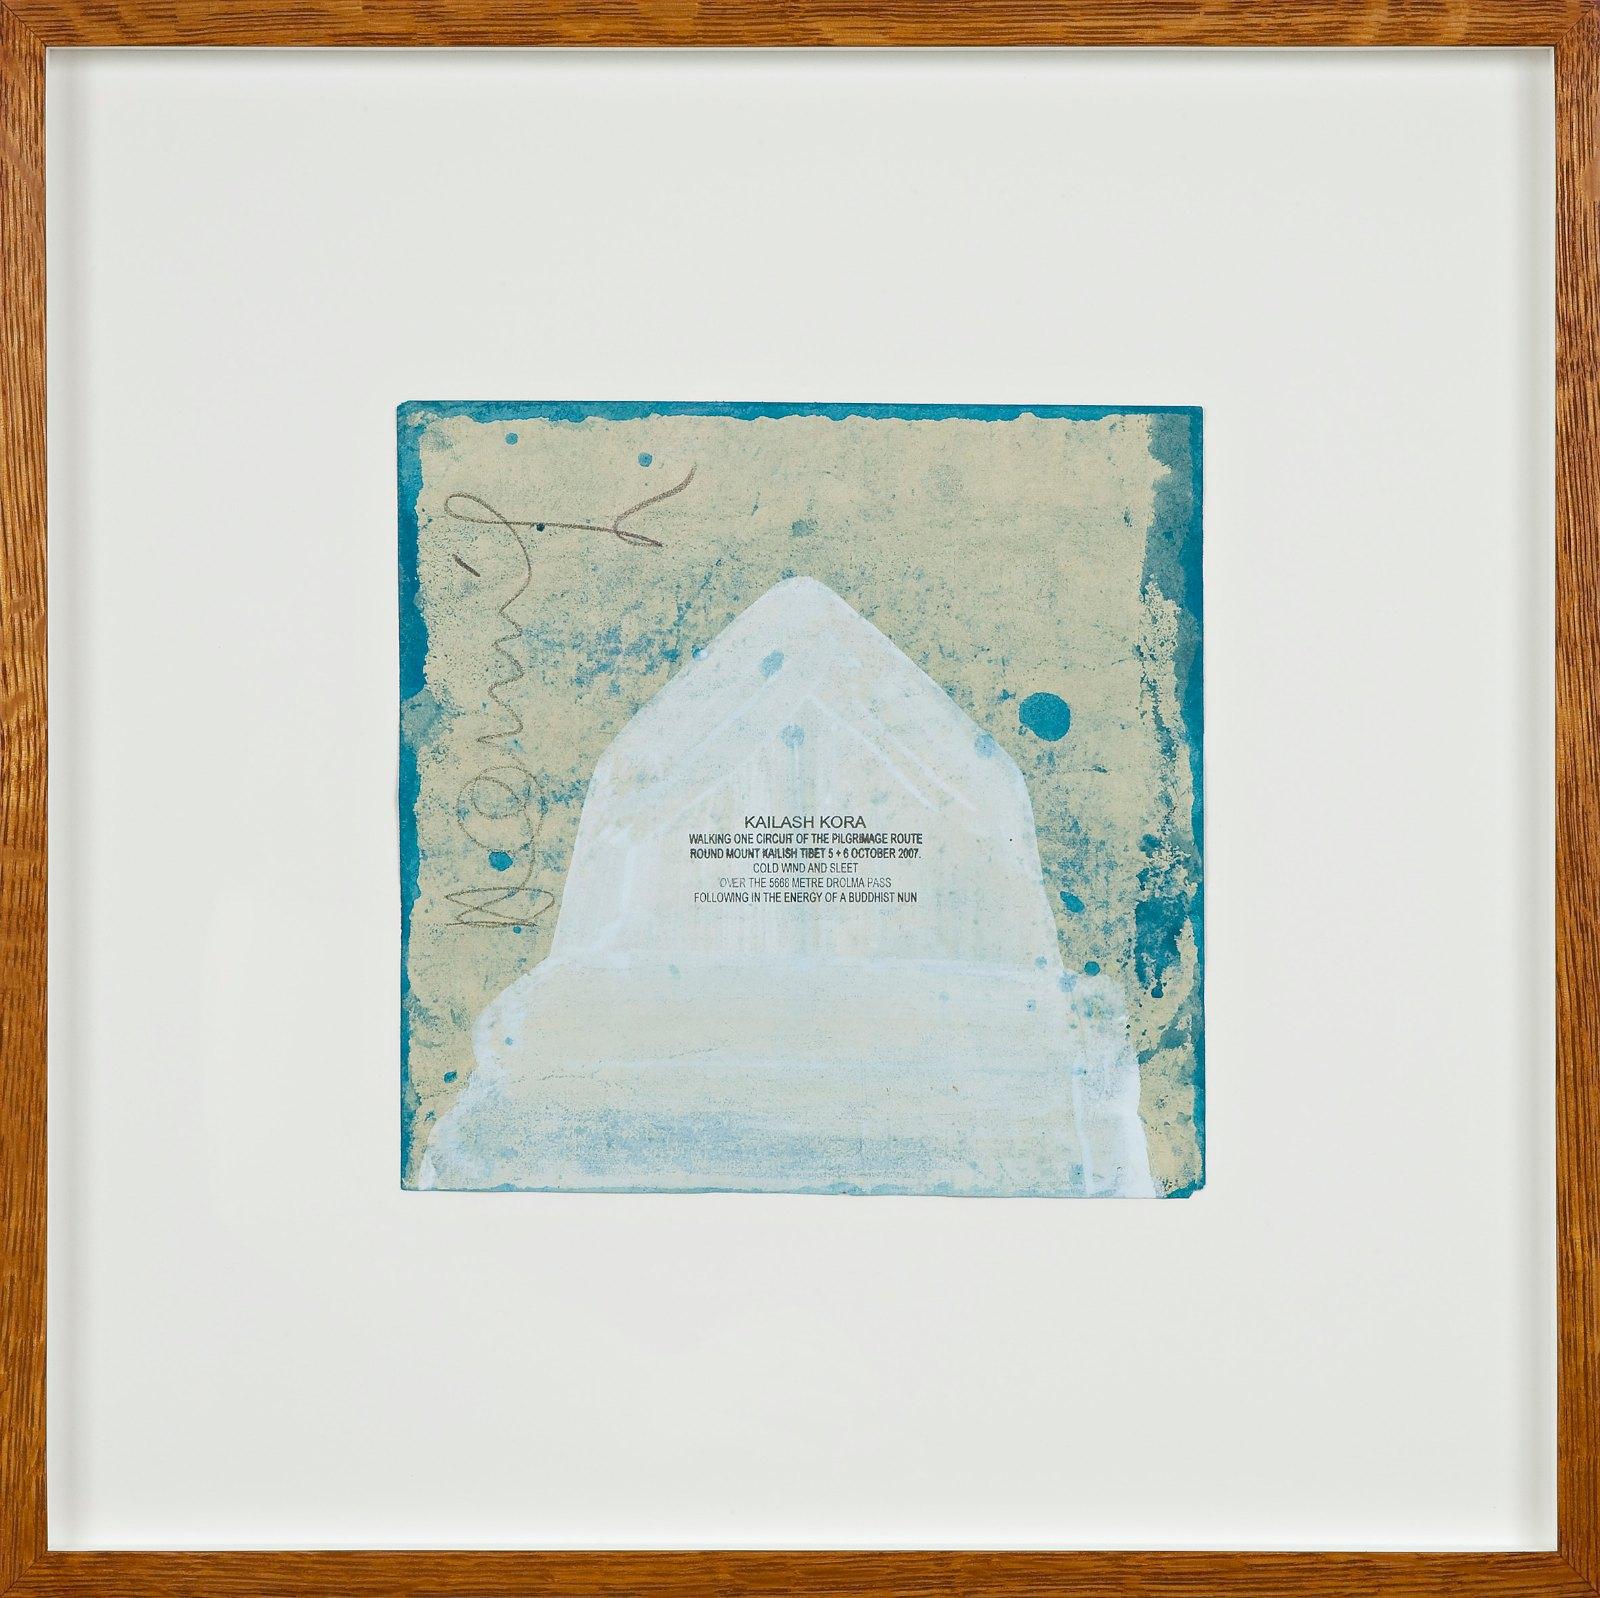 Kailash Kora, 2007, ink walk text on acrylic in artist frame, 21.5 x 21.5 cm